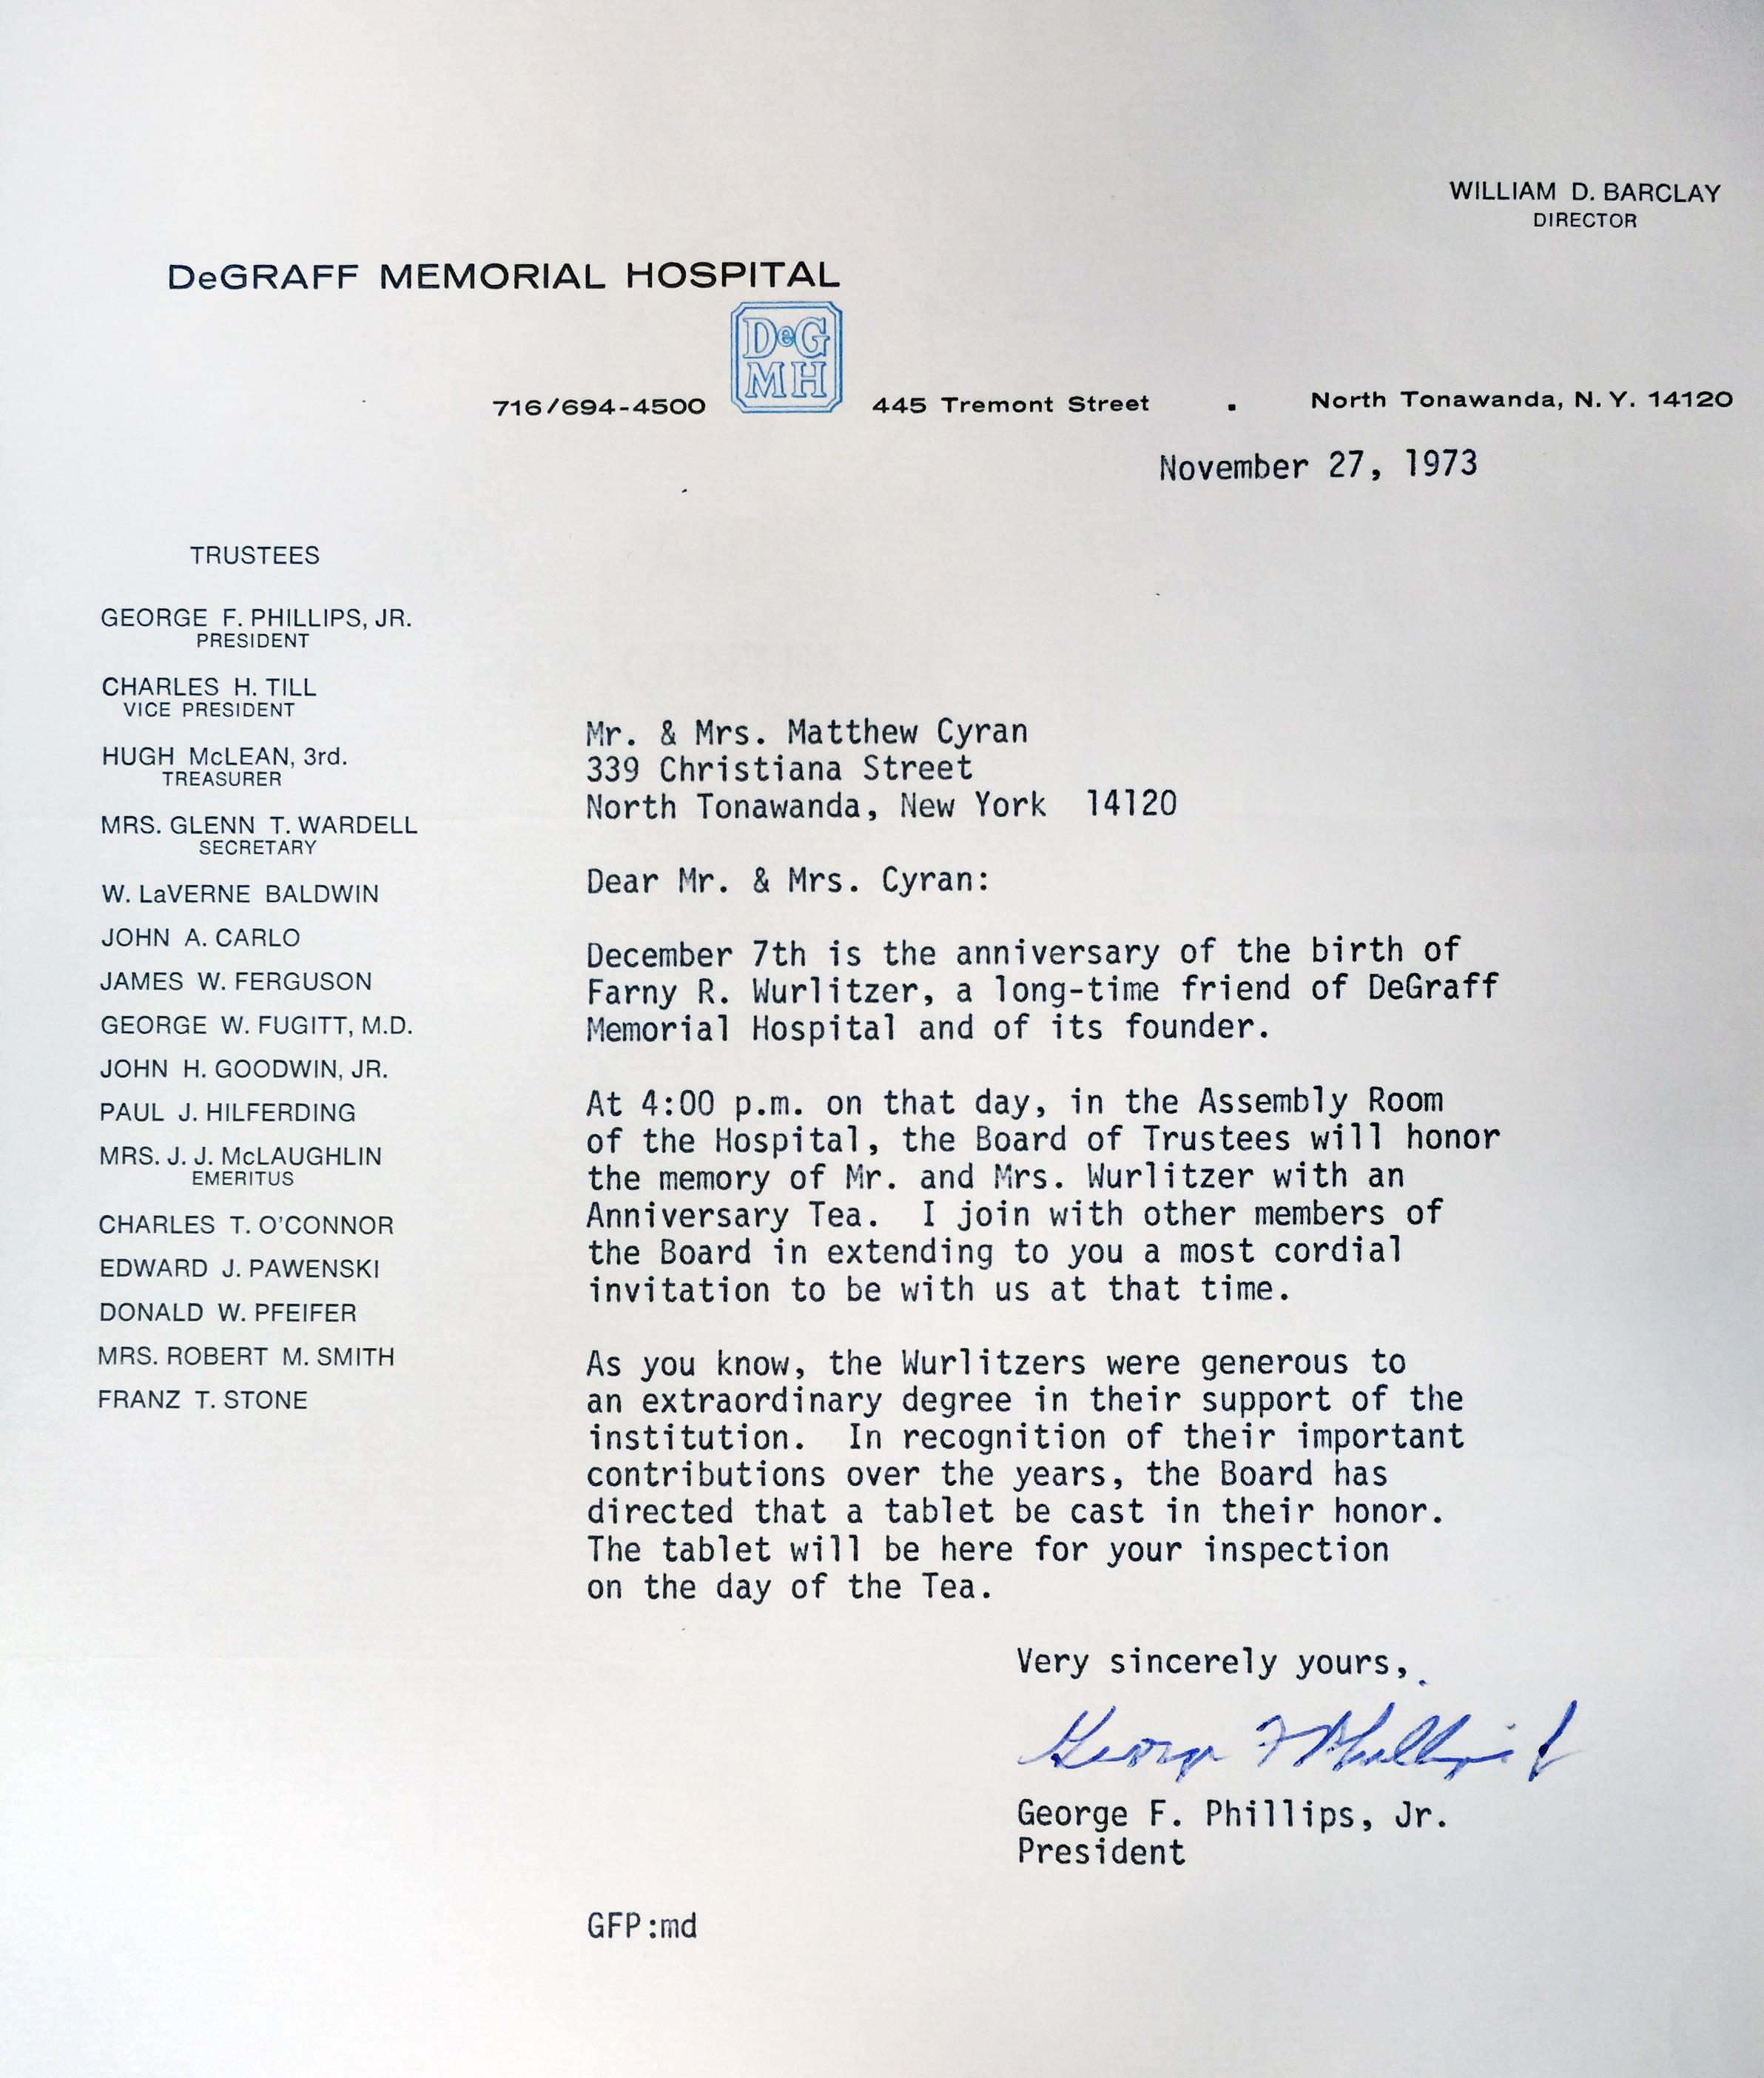 Invitation to anniversary tea in memory of Farny Wurlitzer at DeGraff Hospital, letter (1973-11-27).jpg